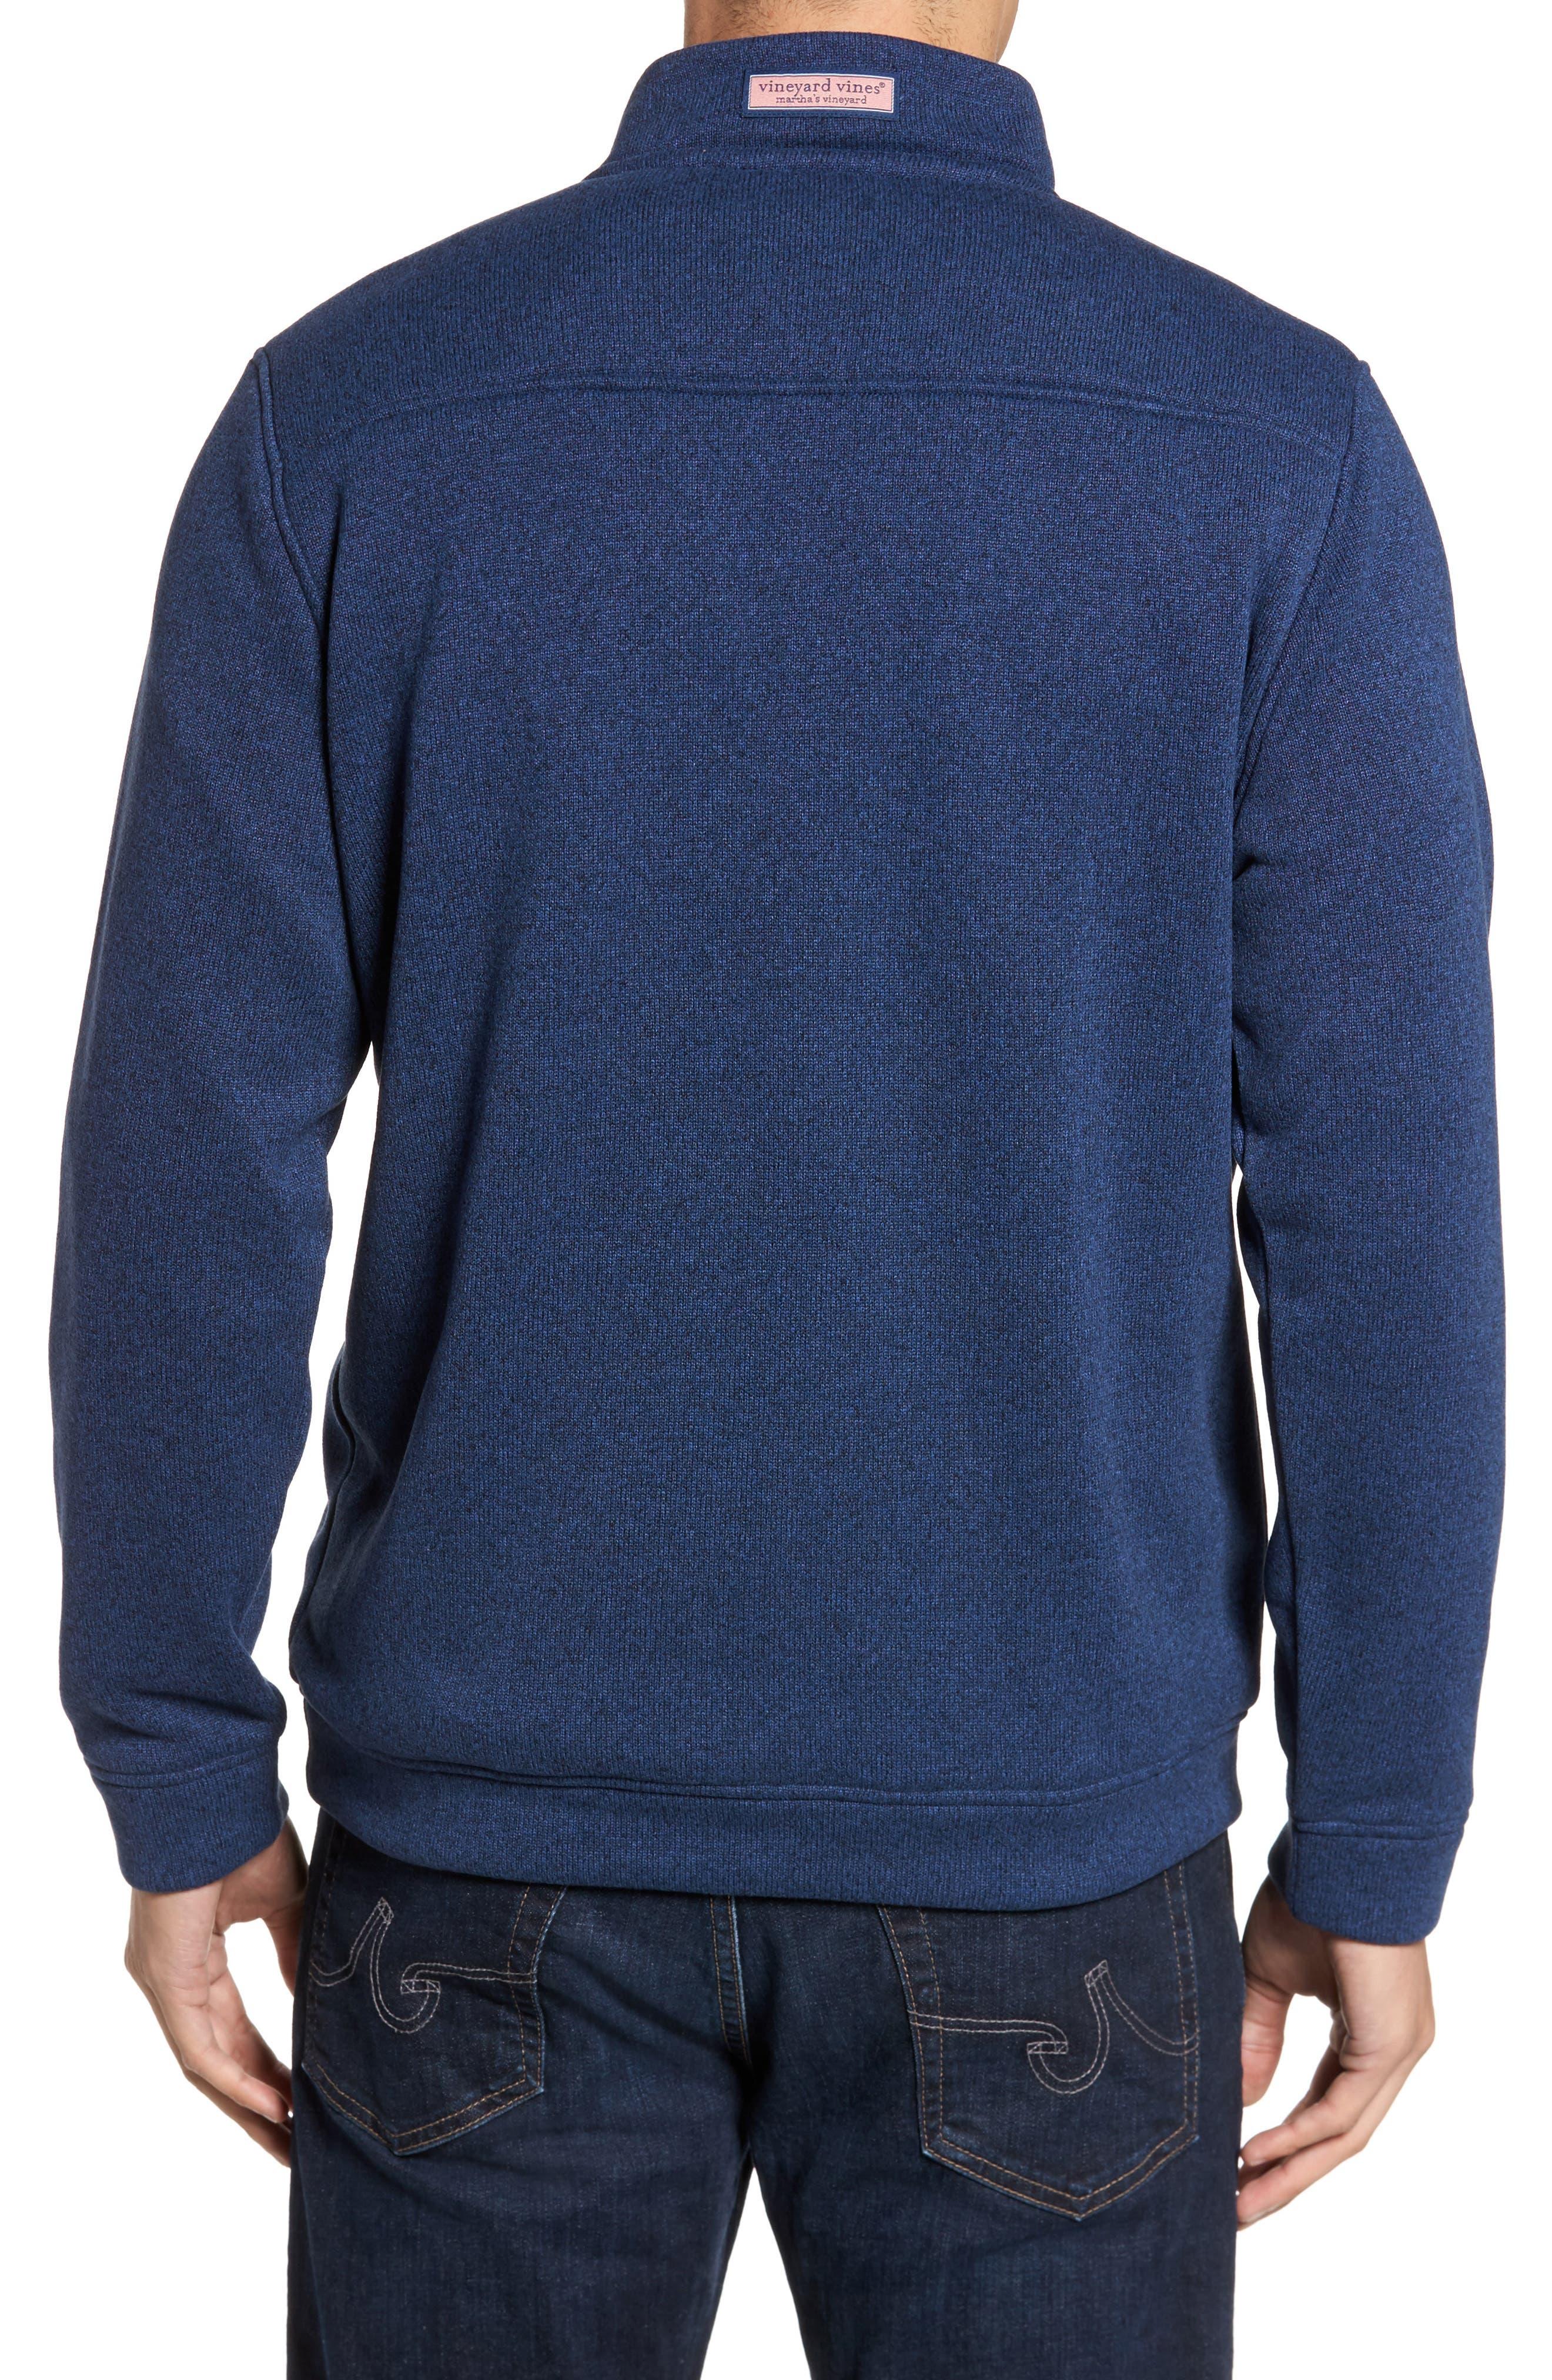 Shep Sweater Fleece Quarter Zip Pullover,                             Alternate thumbnail 4, color,